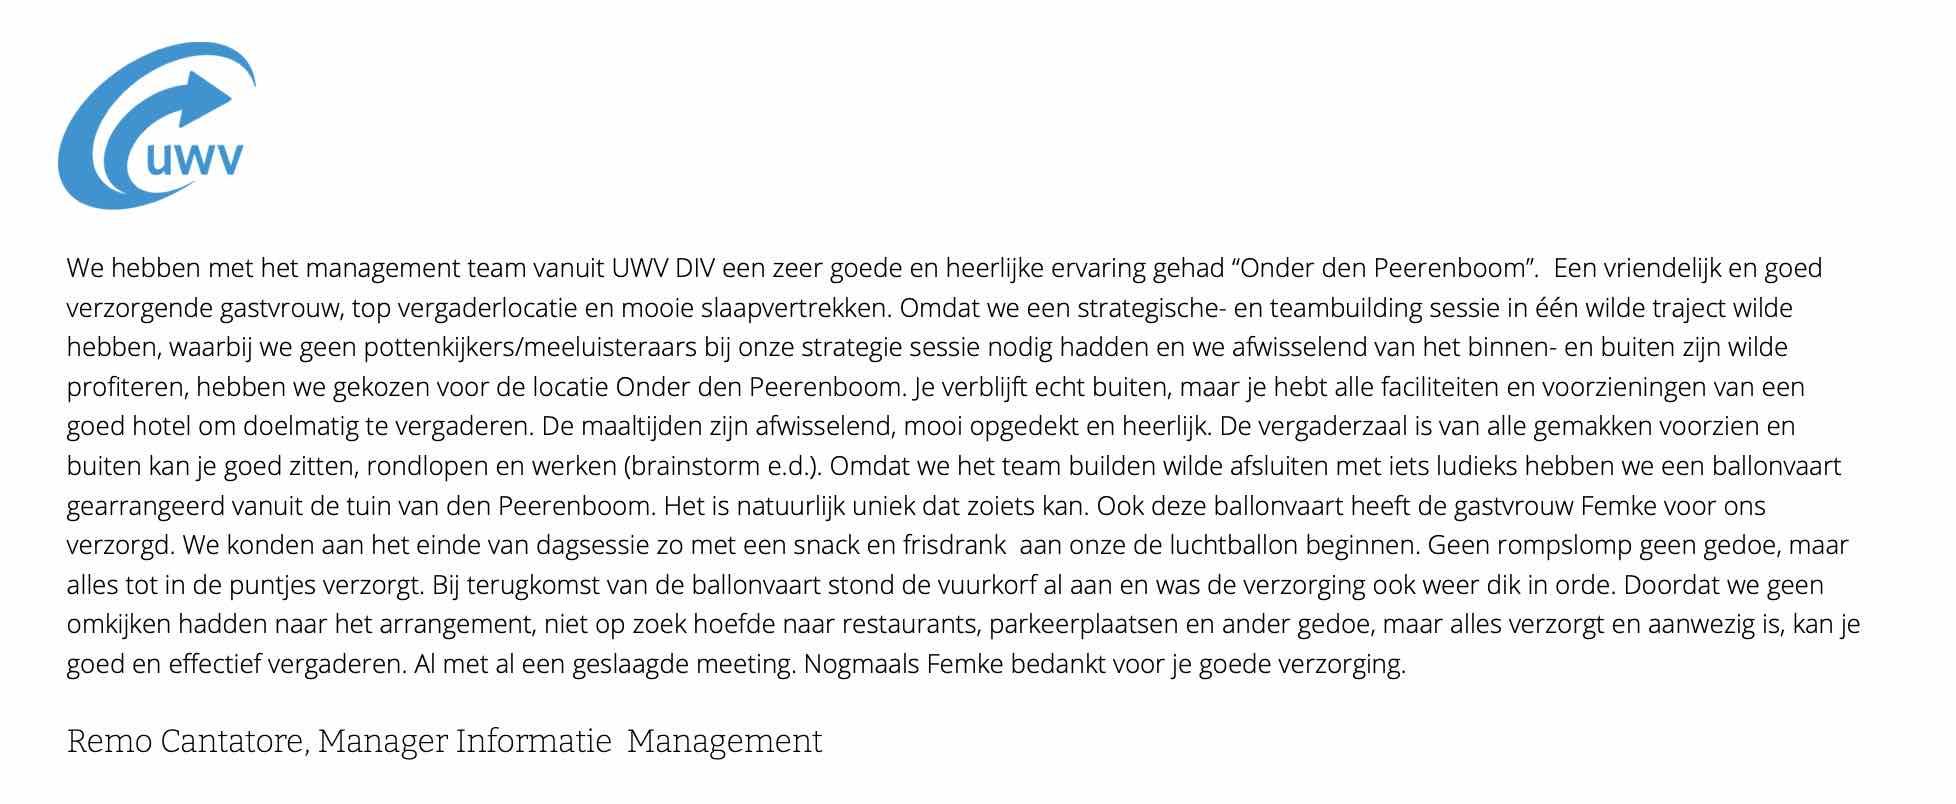 Referentie UWV_2